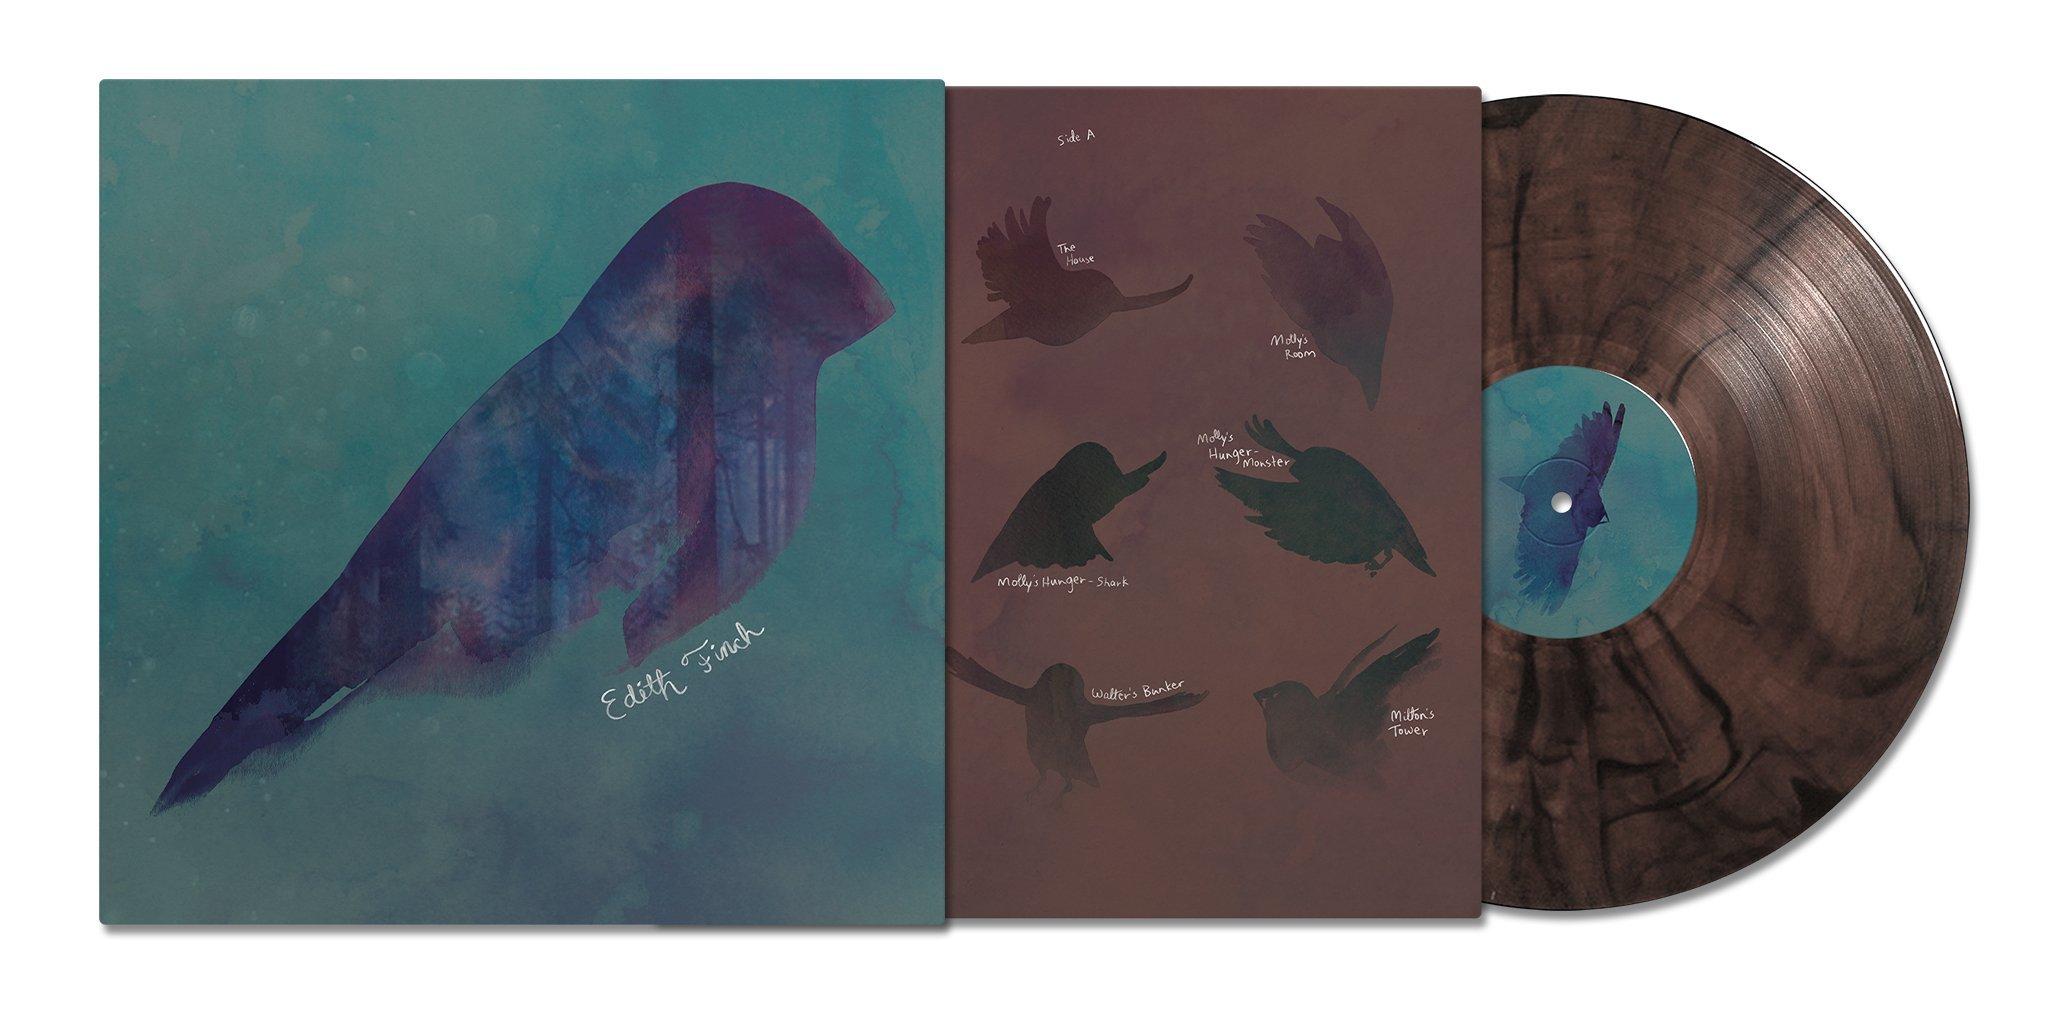 What Remains of Edith Finch Collection / フィンチ家の奇妙な屋敷でおきたこと オリジナルゲームサウンドトラック アナログレコード - 画像5